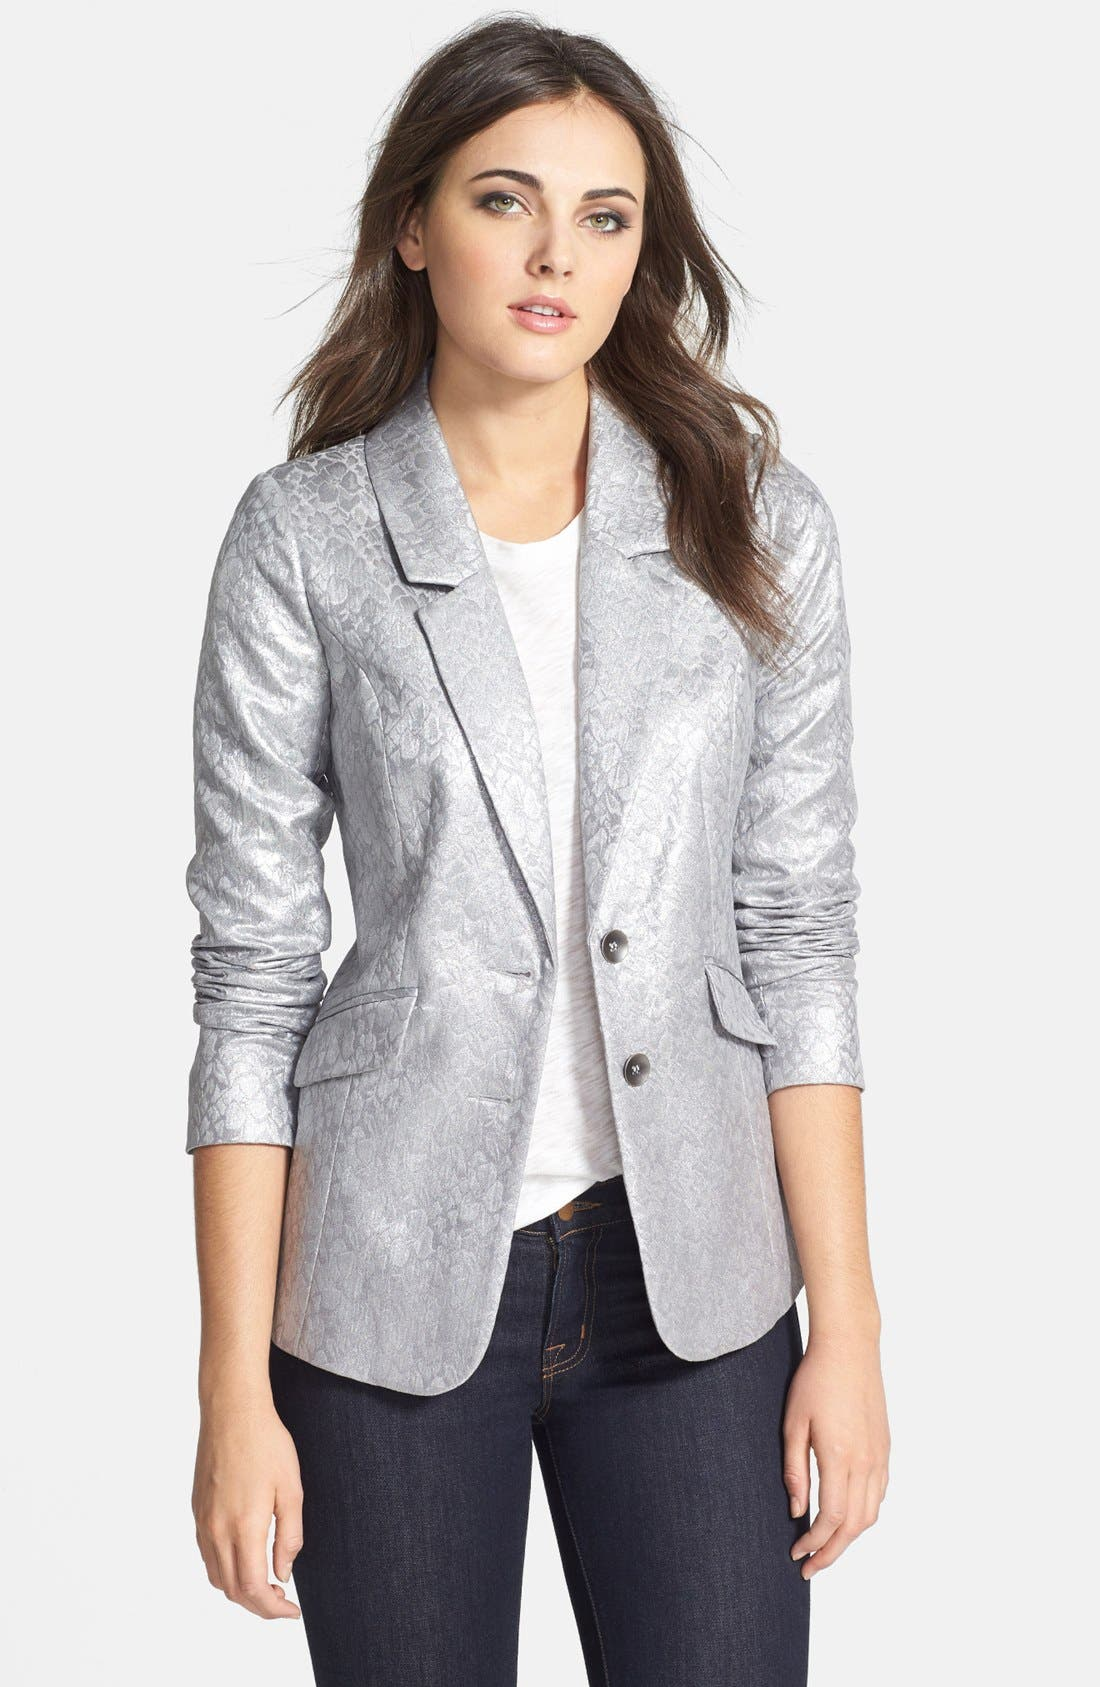 Main Image - kensie Foil Brocade Jacquard Jacket